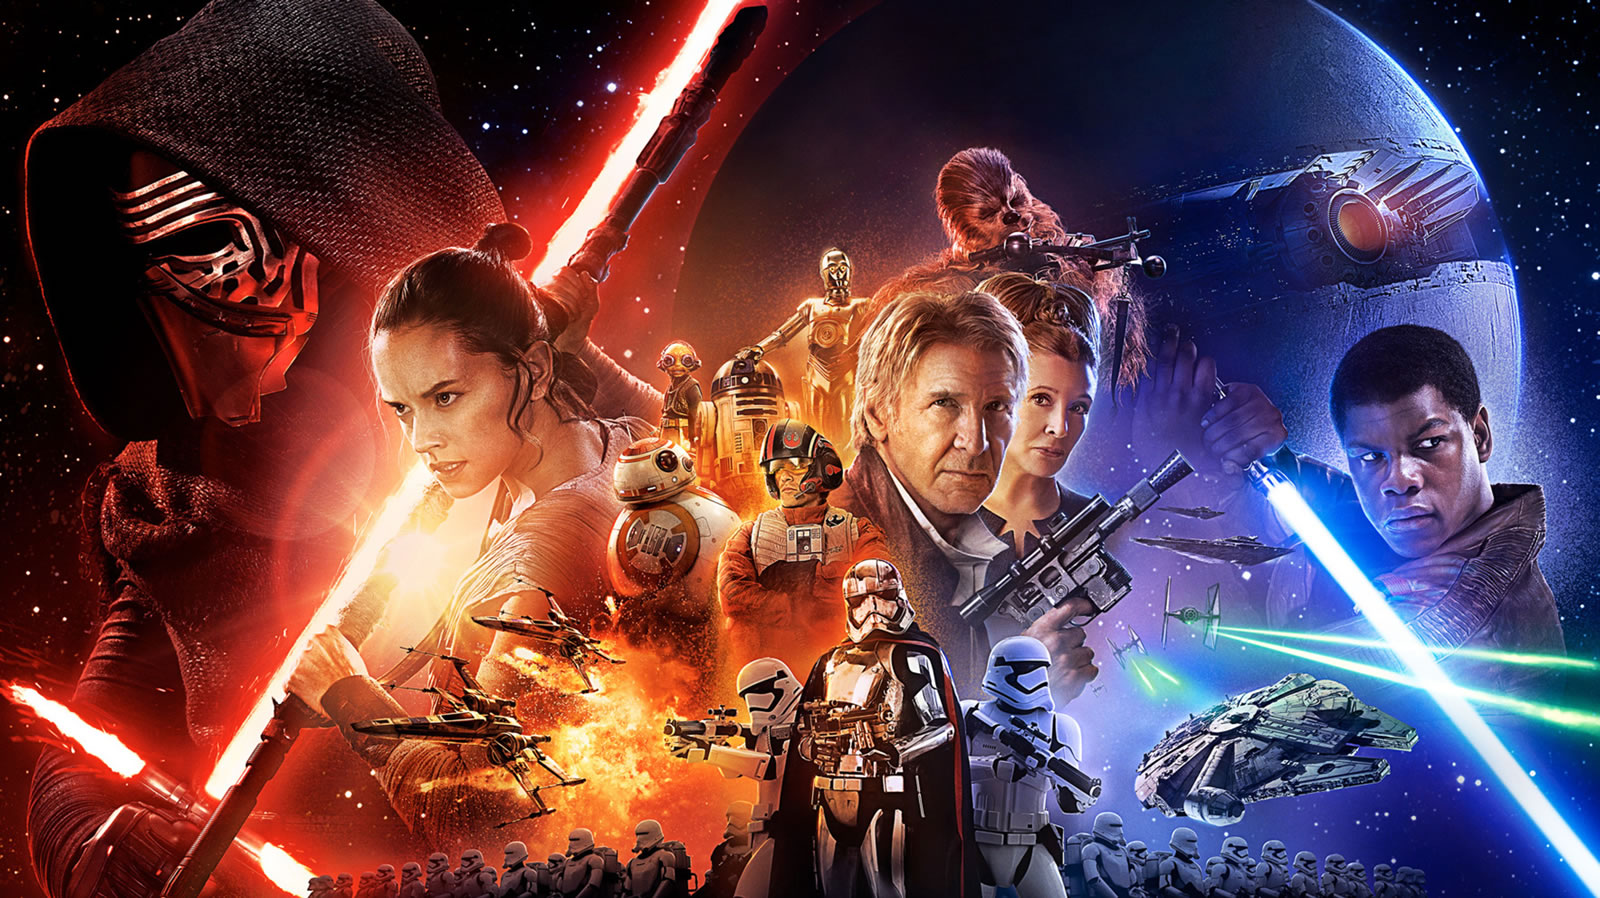 Star Wars Force awakens wallpaper 7 1600x898